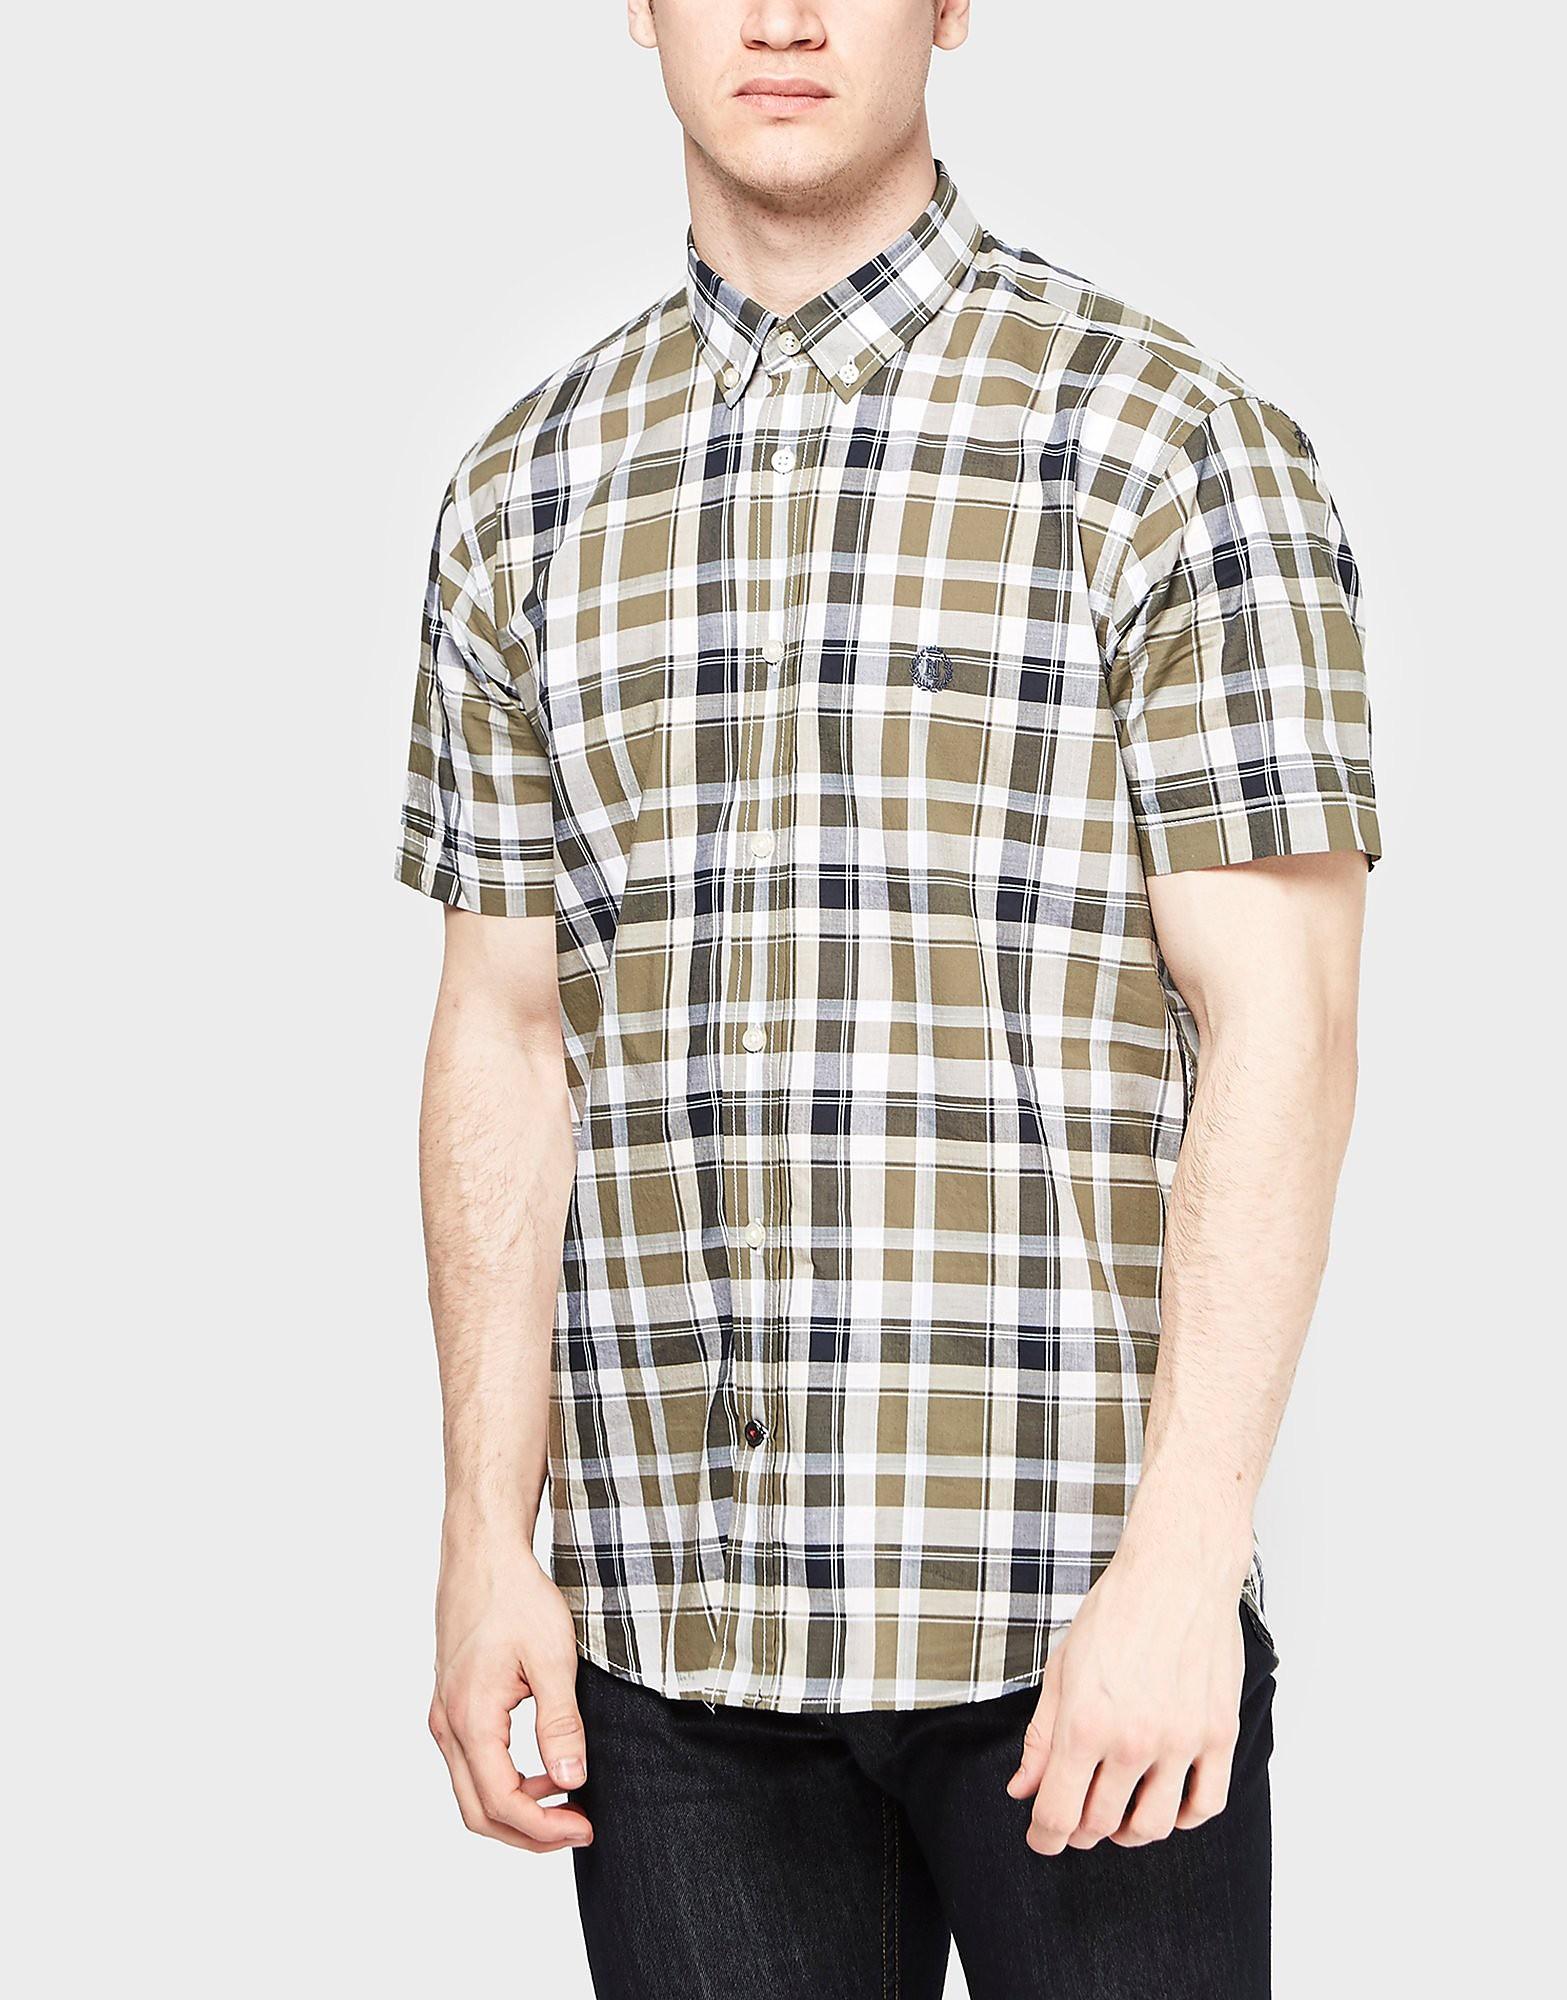 Henri Lloyd Quinton Check Shirt